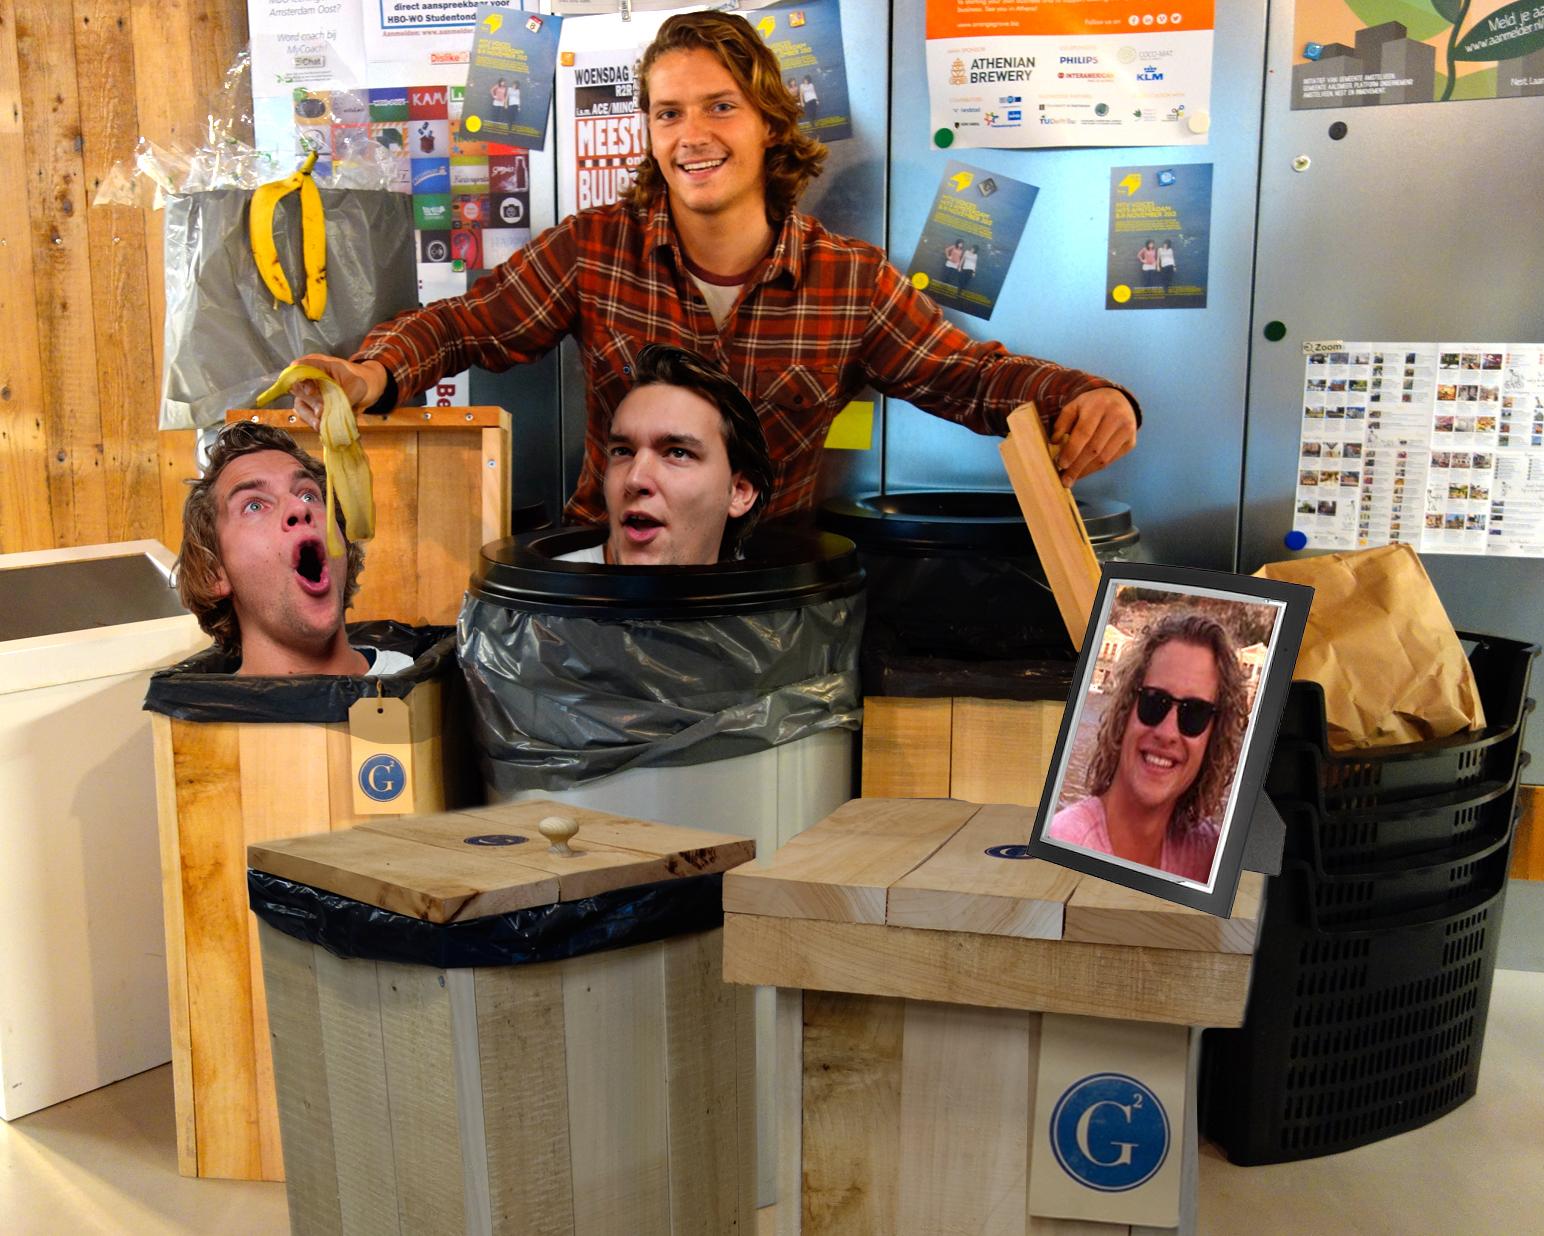 2013-Garbage bin-ondernemer HVA-fotocartoon AvH -1